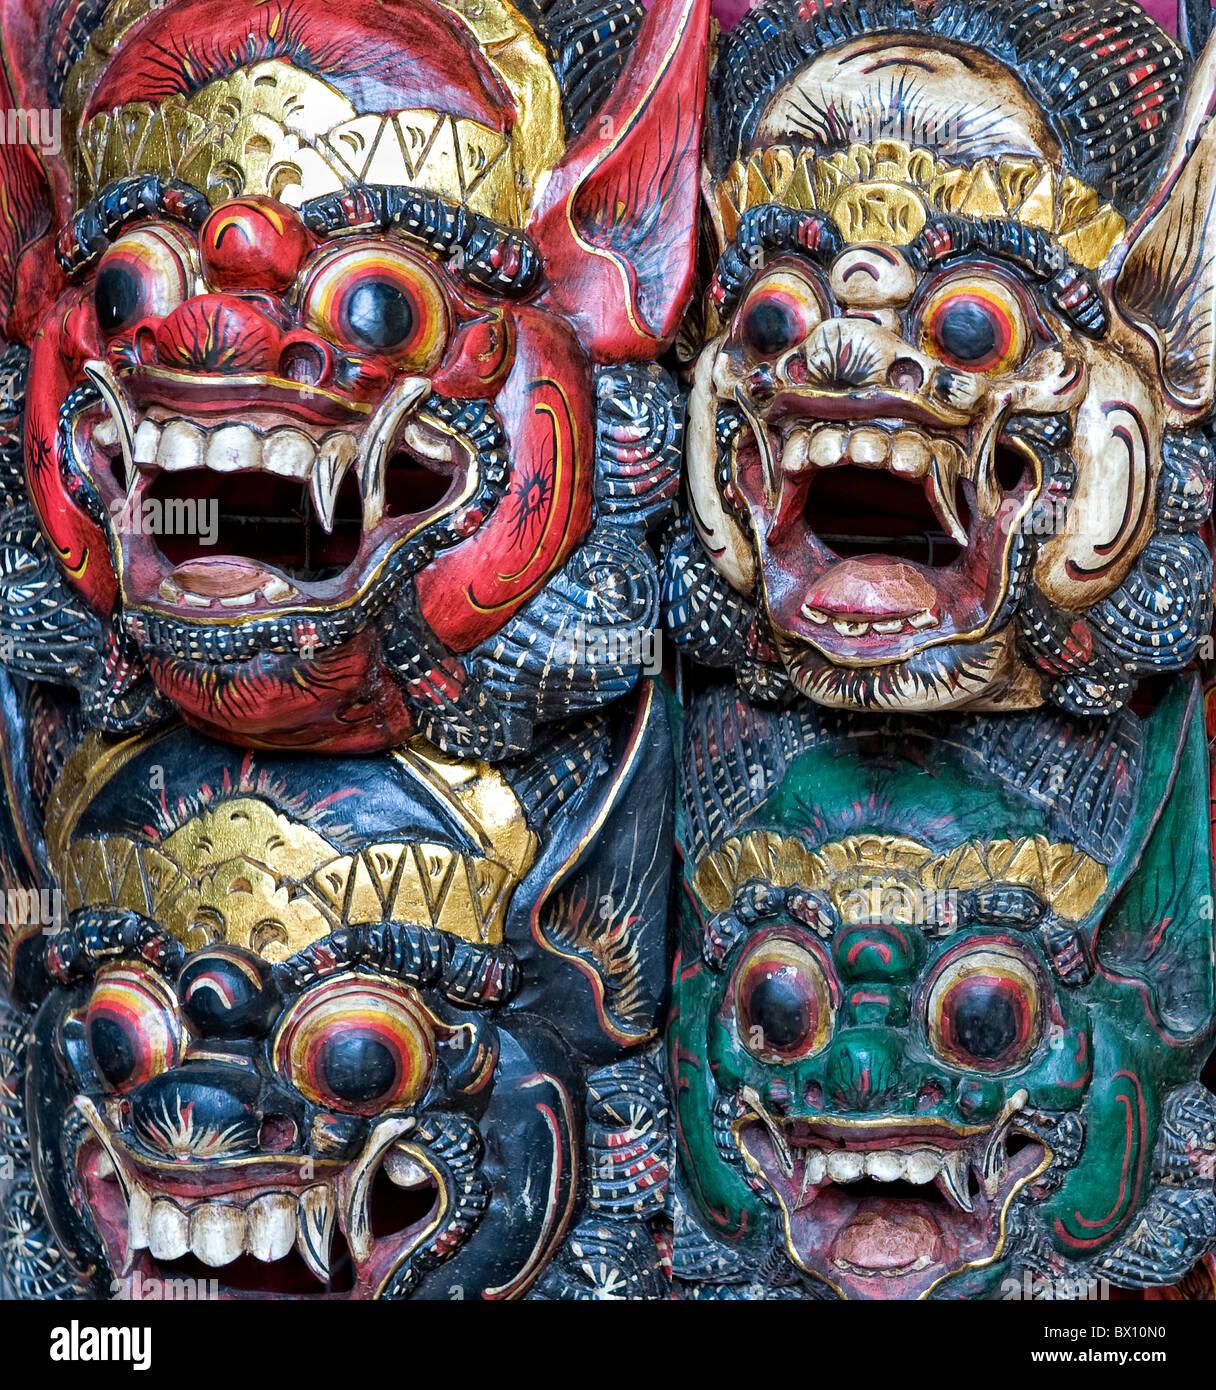 Buddhist  cultural masks - Stock Image